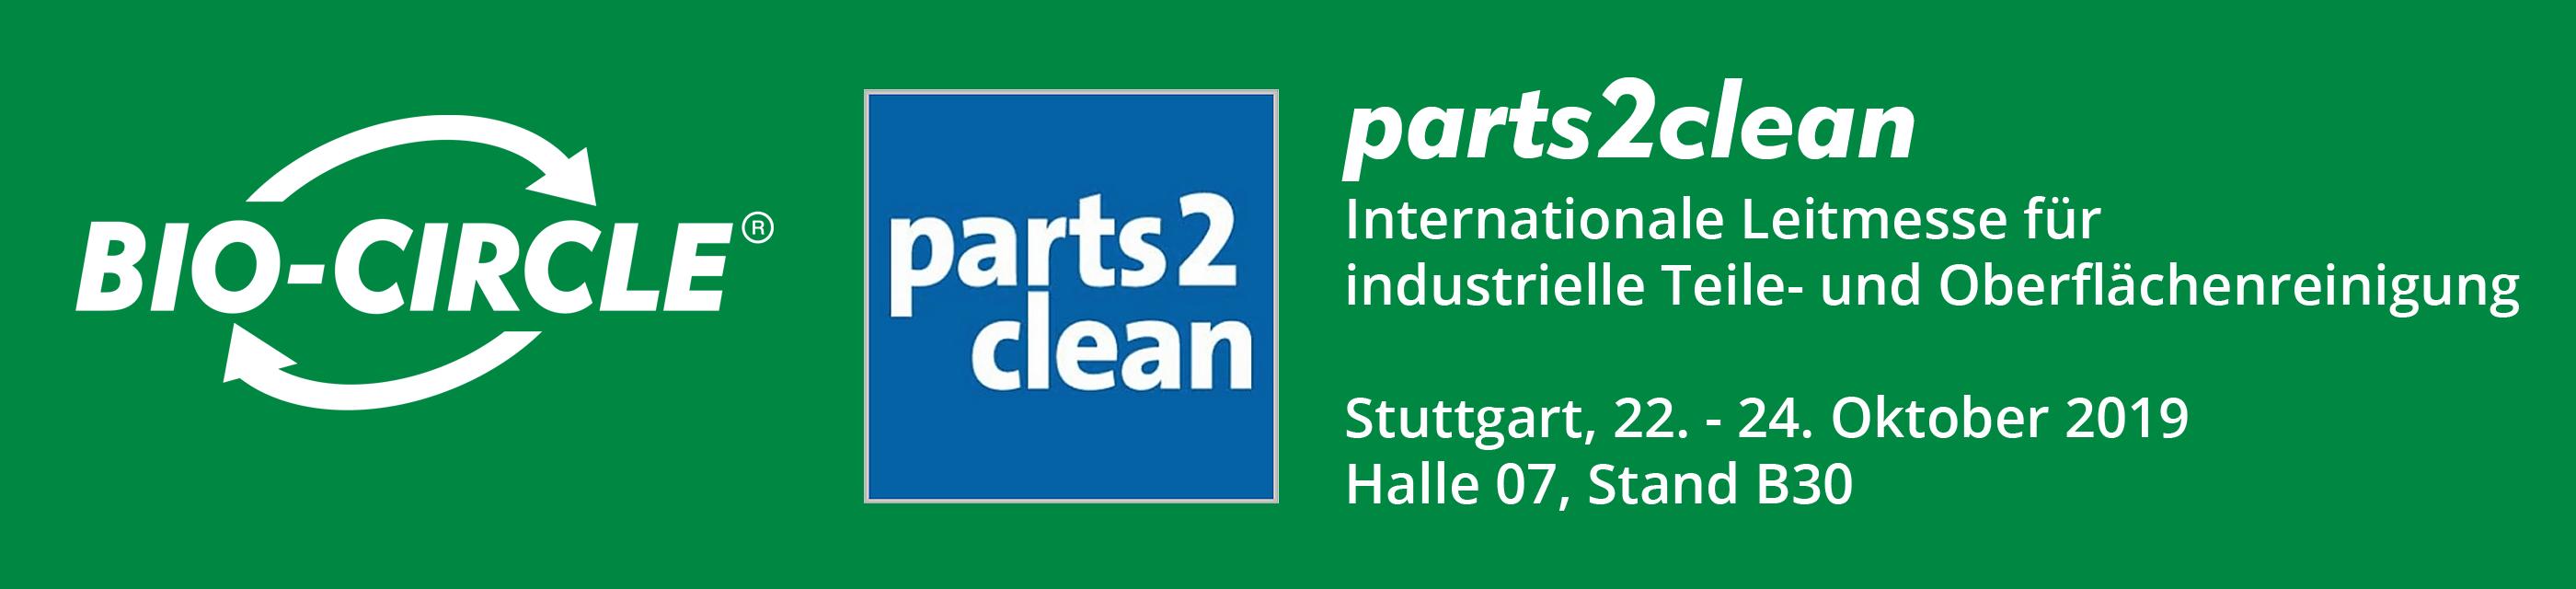 Messe_Info_Banner_Parts2CleanStuttgart_2019_DE